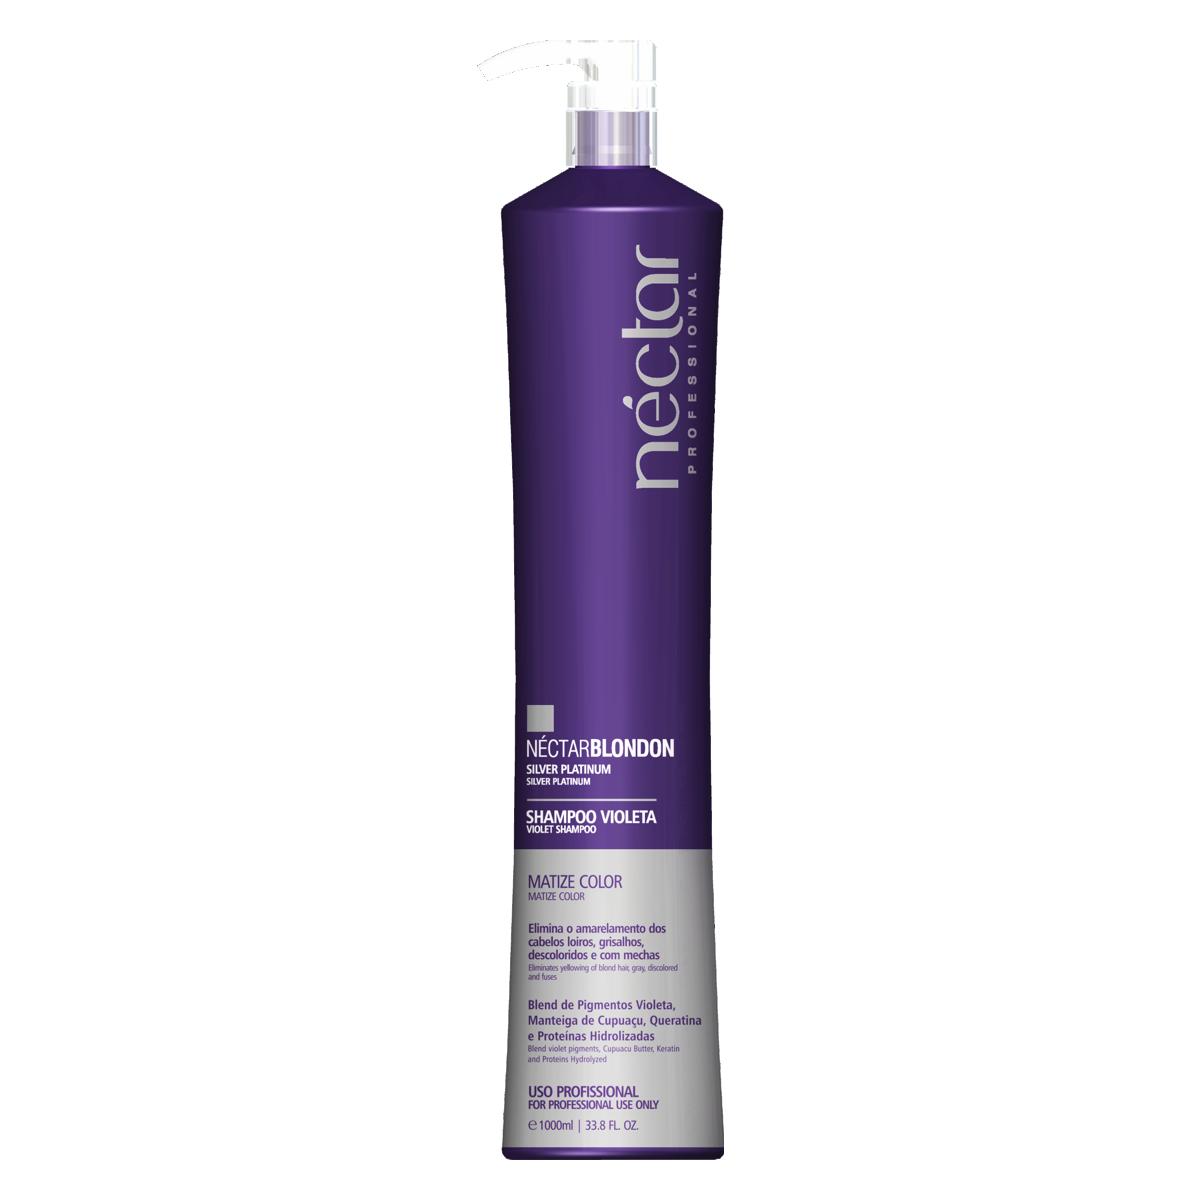 Shampoo Violeta Professional 1000ml - Néctar Blond